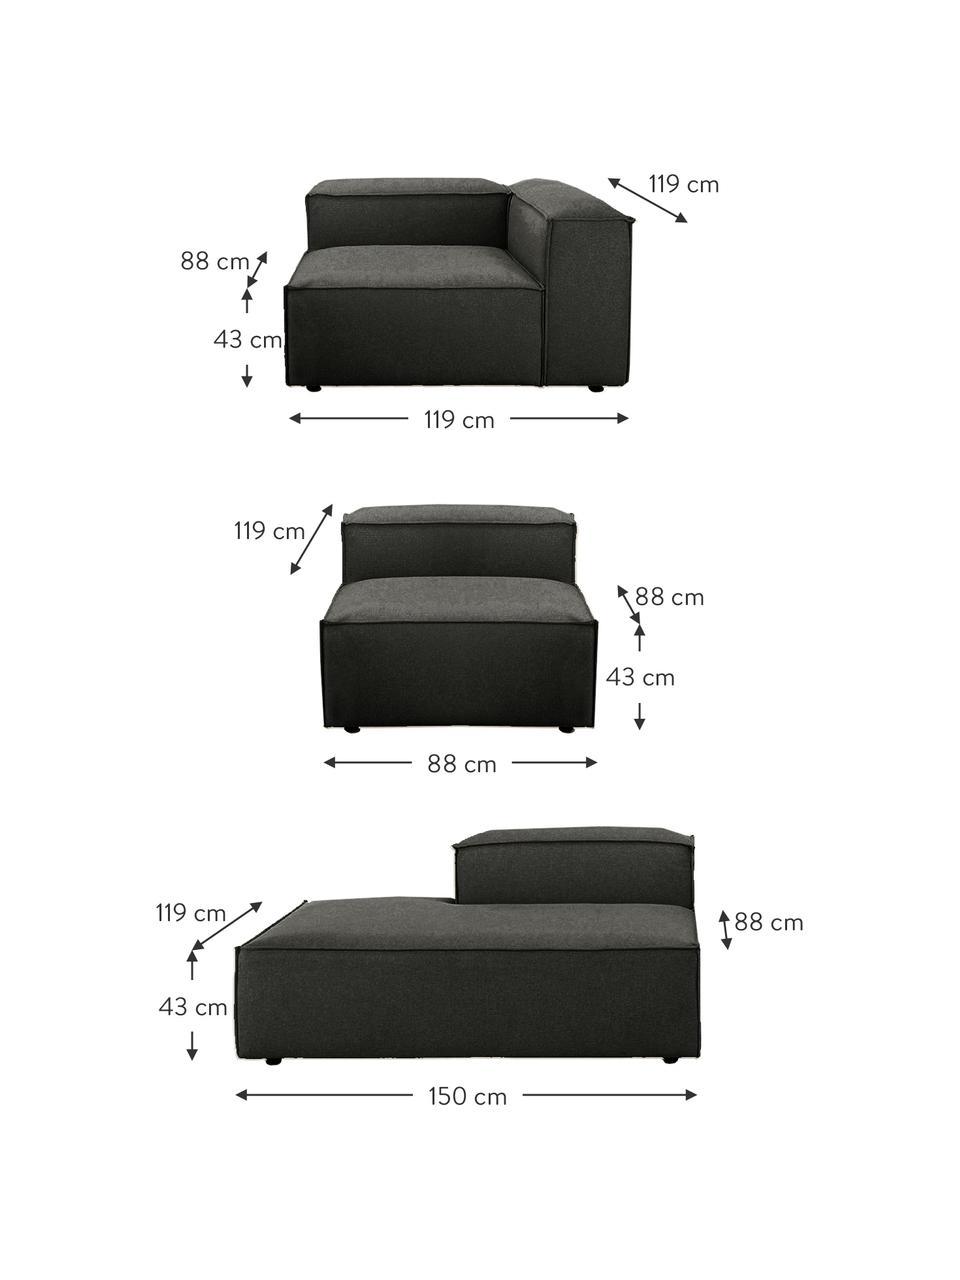 Canapé modulable XL gris anthracite Lennon, Tissu anthracite